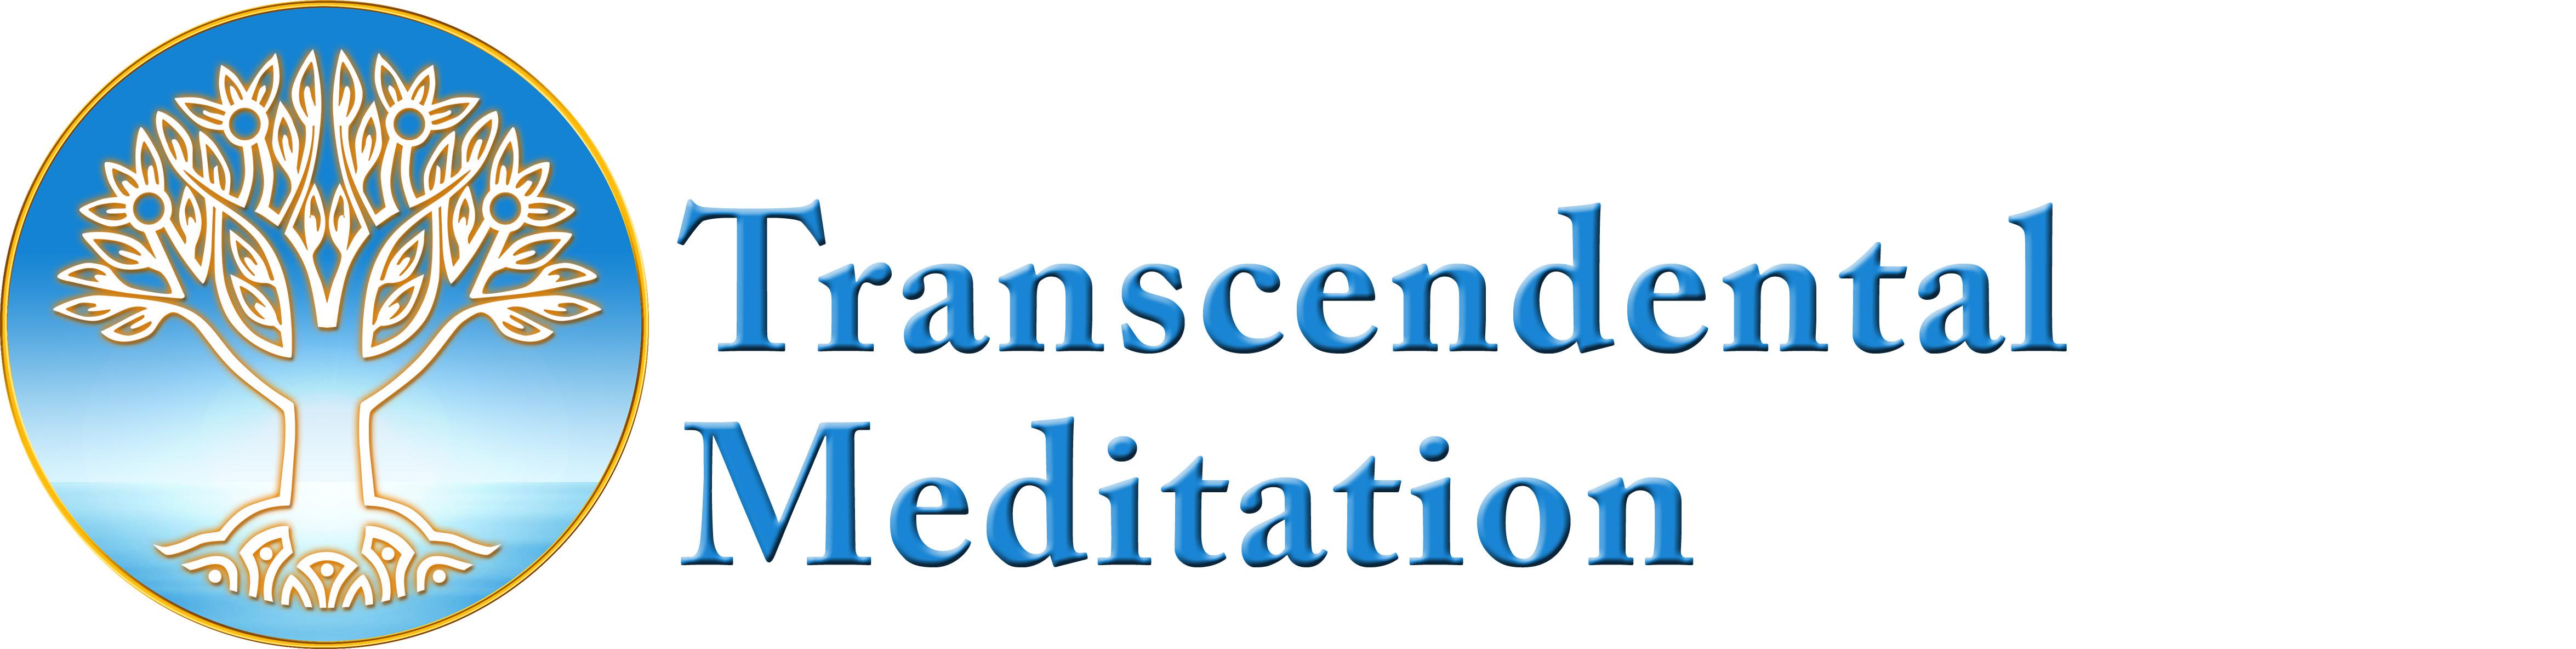 Transcendental Meditation™ undefined classes in London